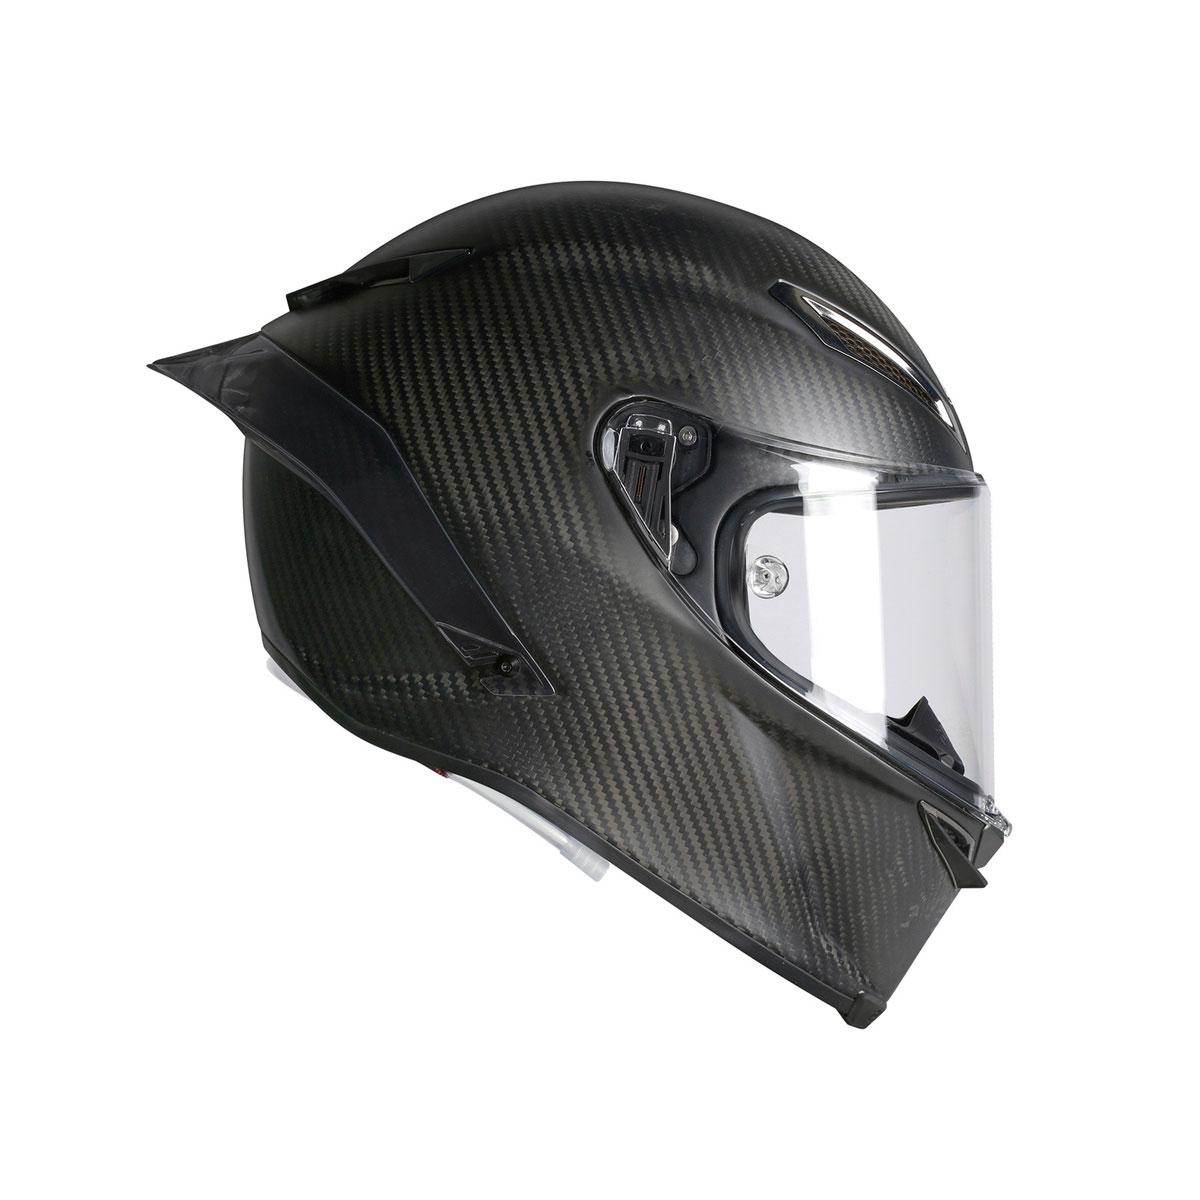 Carbon Fiber Motorcycle Helmets >> Agv Pista Gp R Carbon Full Face Motorcycle Helmet Matte Carbon Fiber